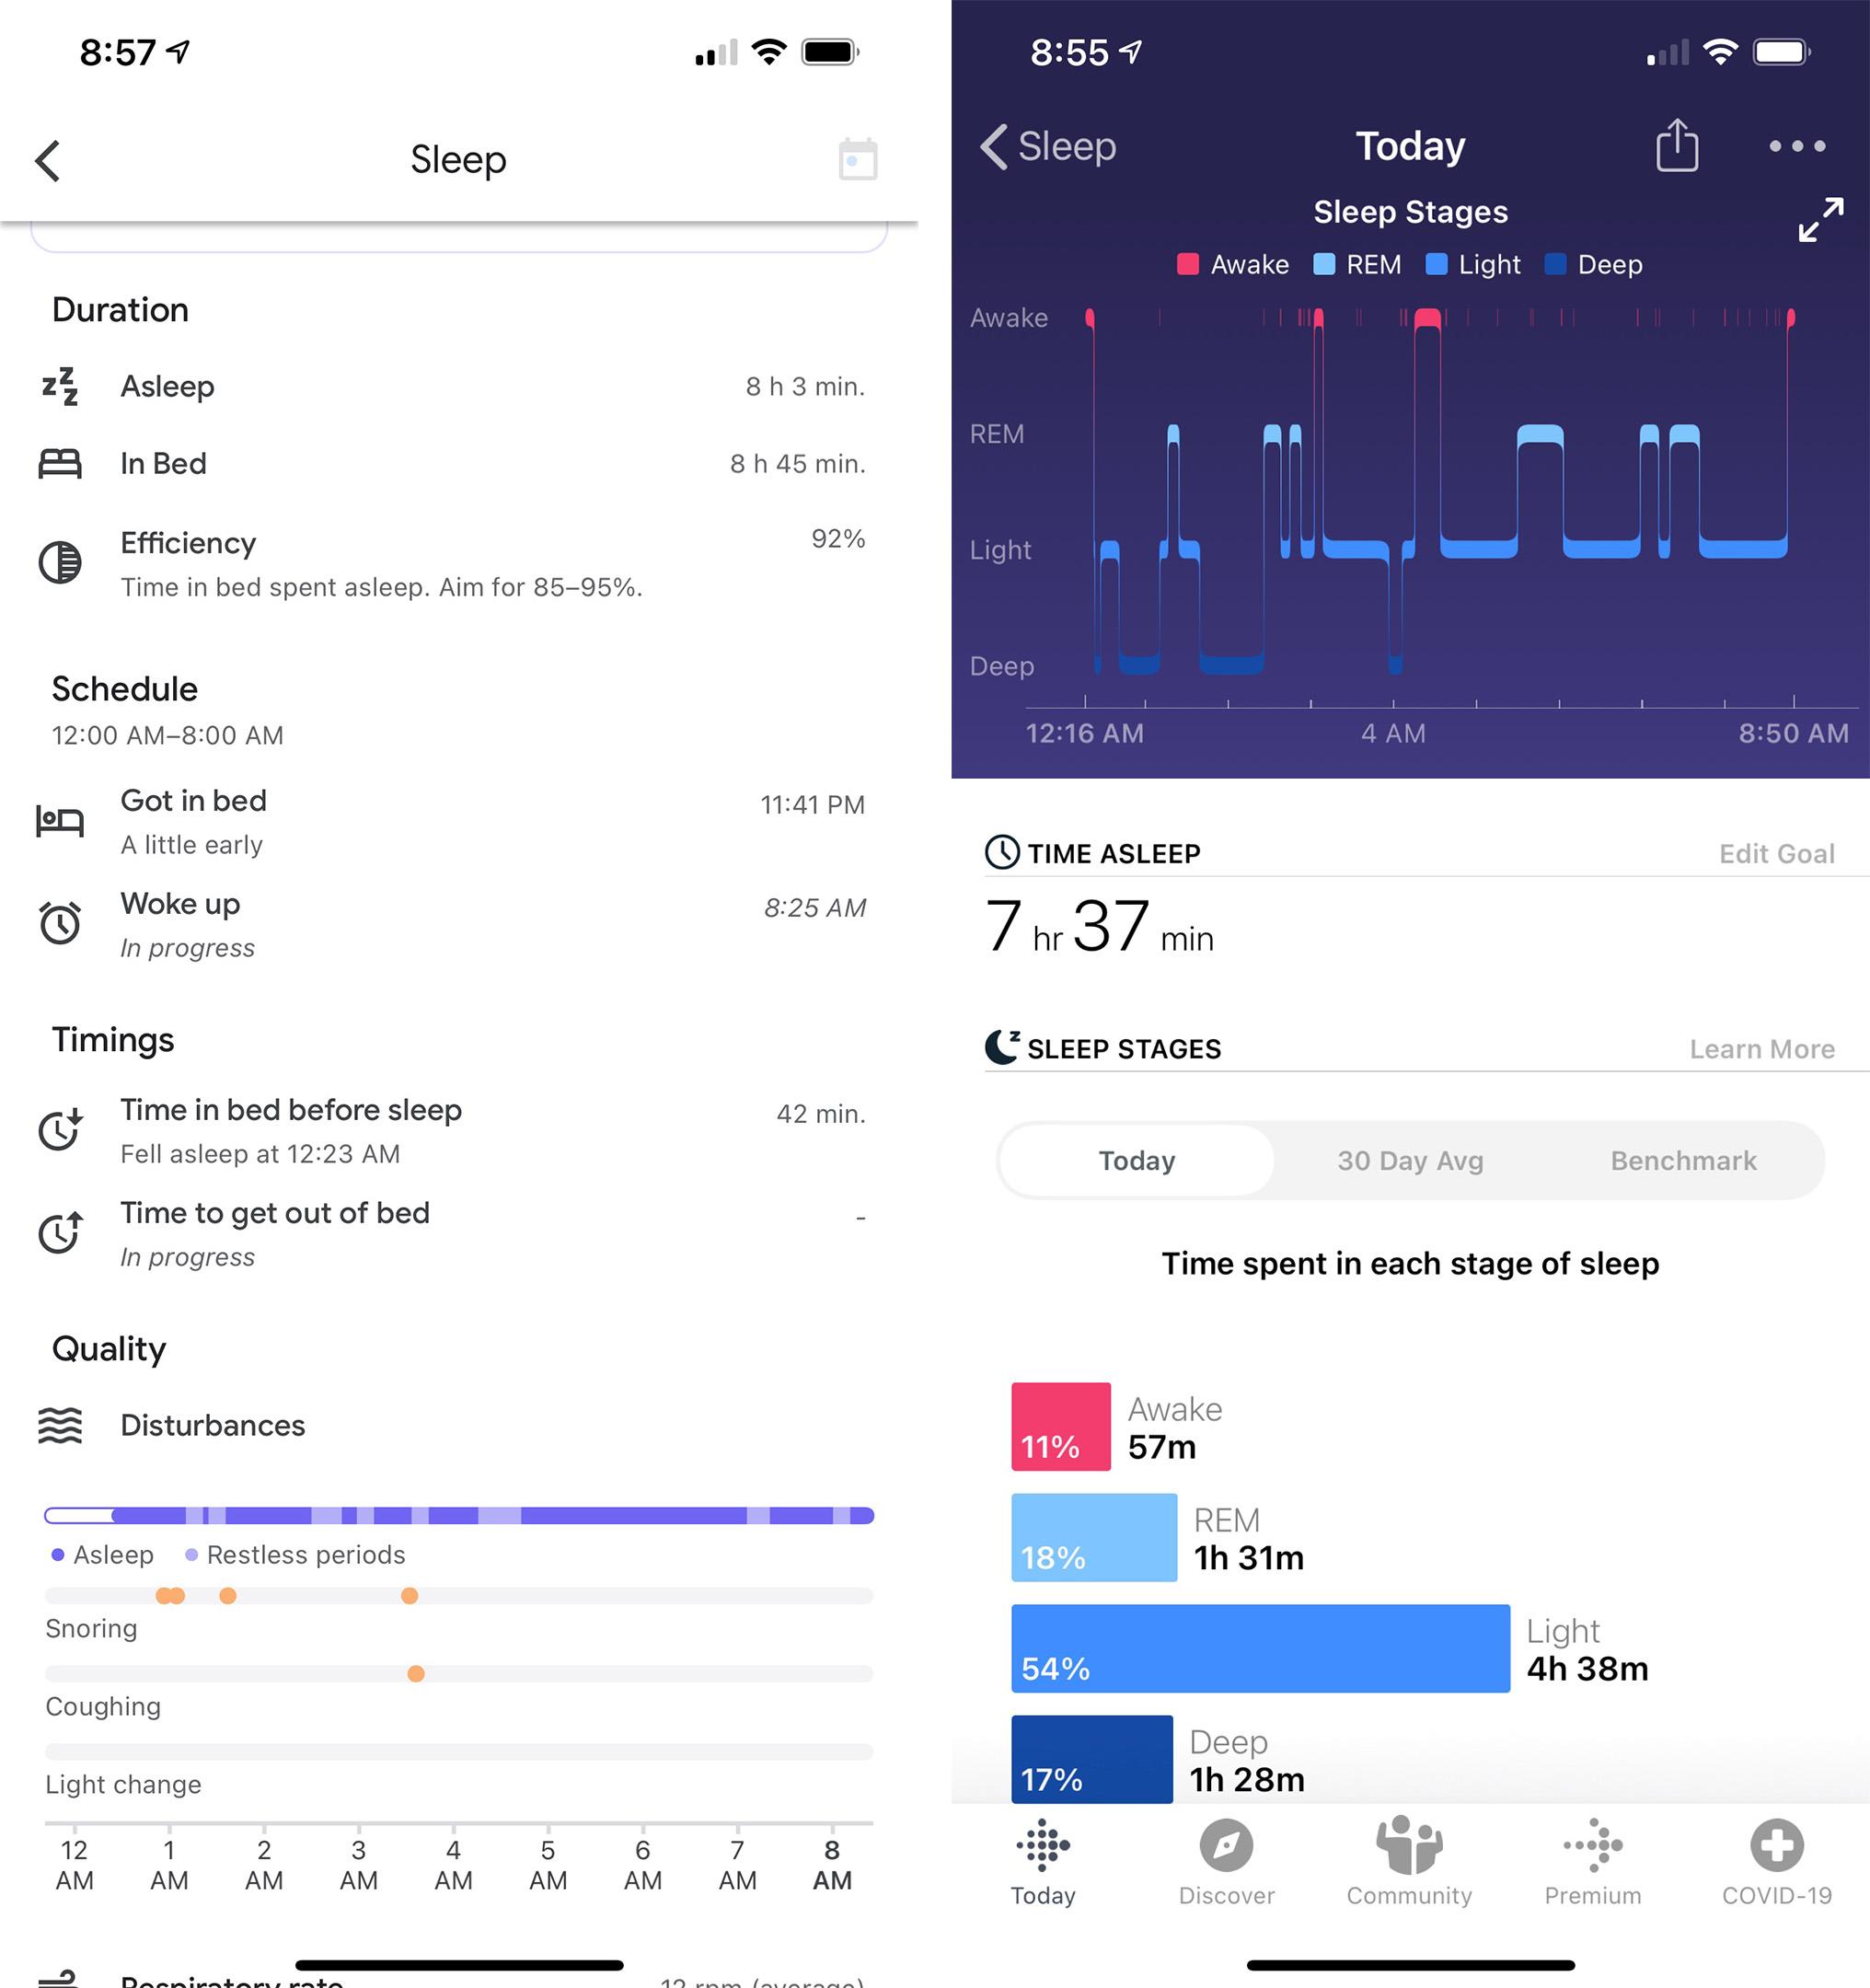 Nest Hub (2021) vs the Fitbit Versa 2